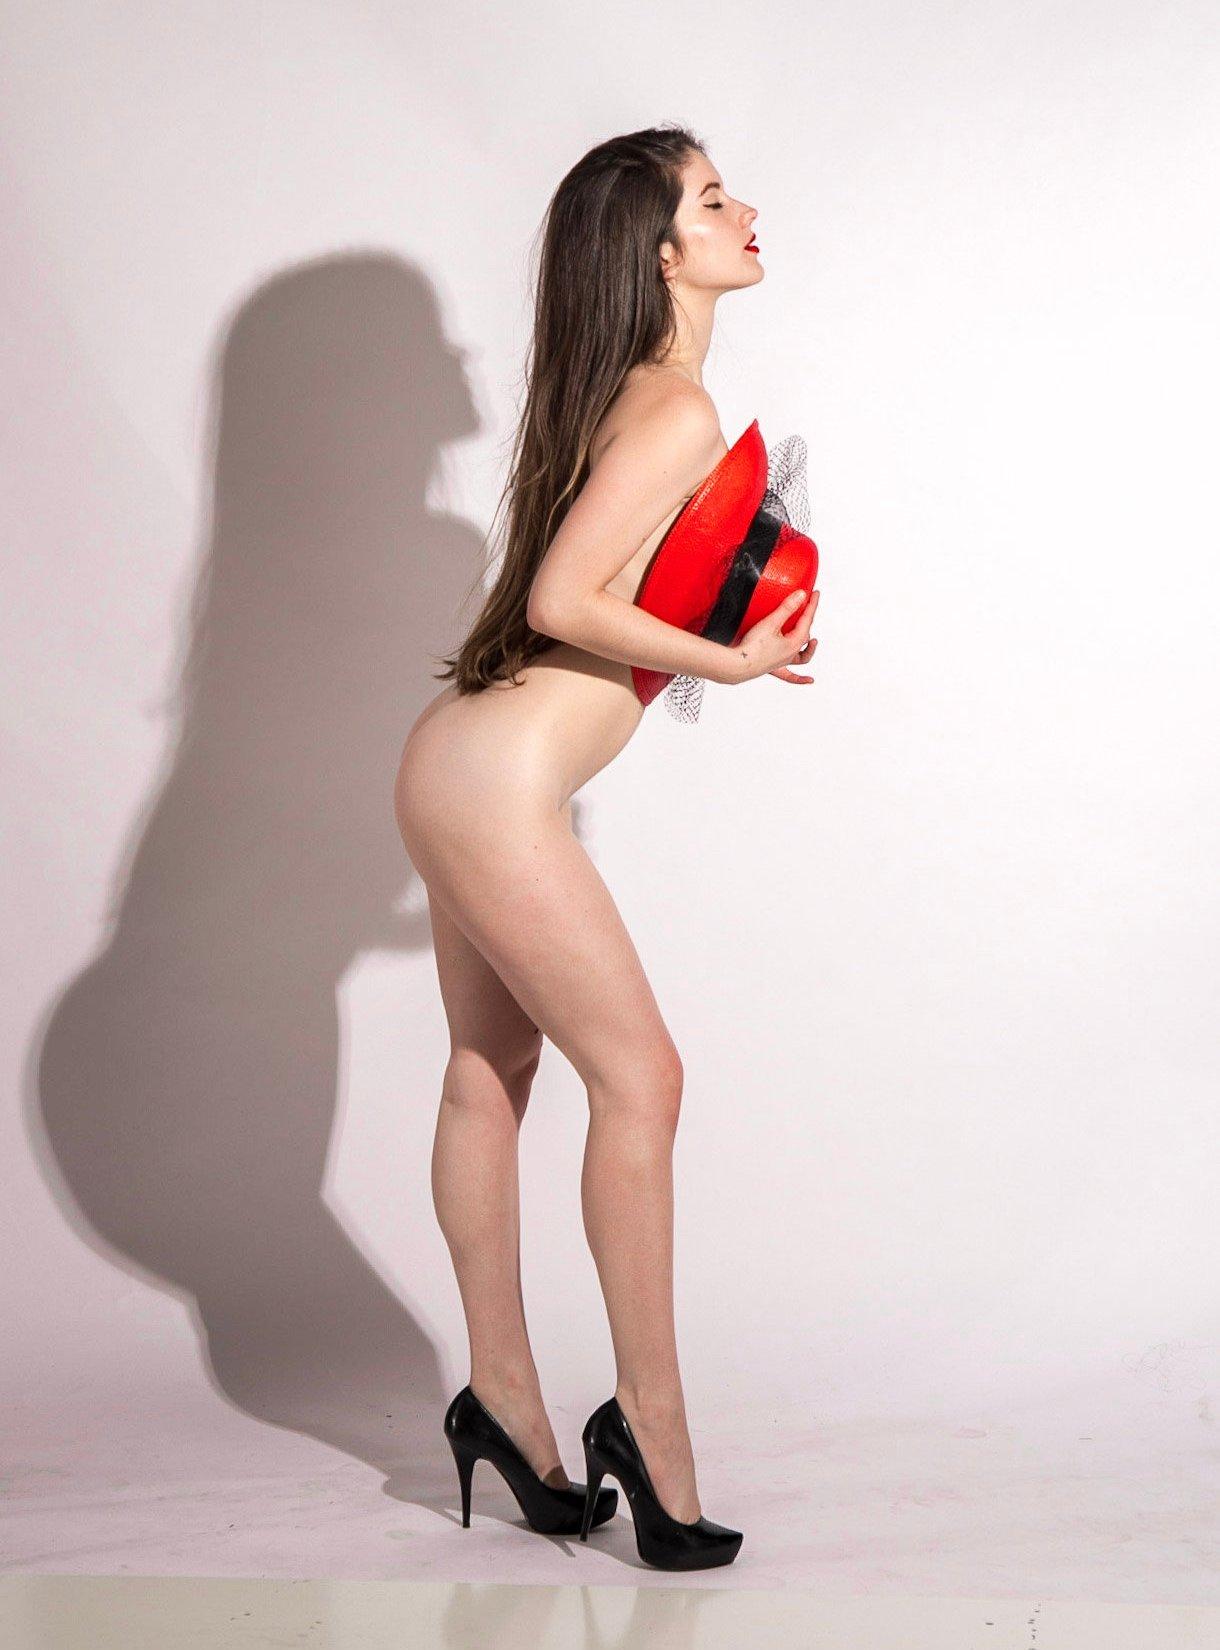 Bella Donna Bellatrixortreat Nudes Leaks 0089